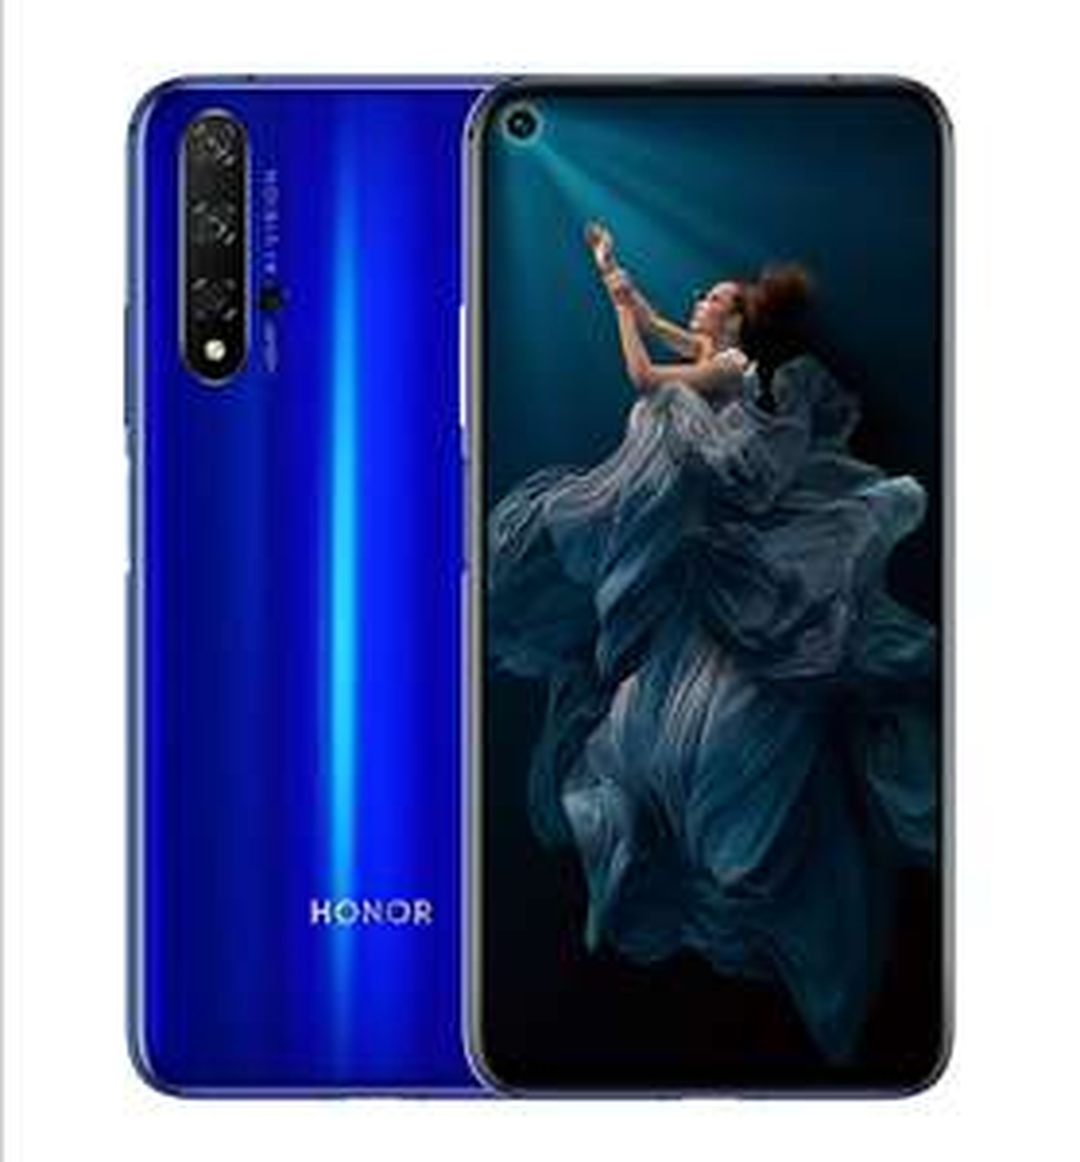 HONOR 20 Dual SIM Smartphone, 6.26 Inch Display, 48 MP AI Quad Camera, 6GB RAM + 128 GB storage £308.55 @ Amazon